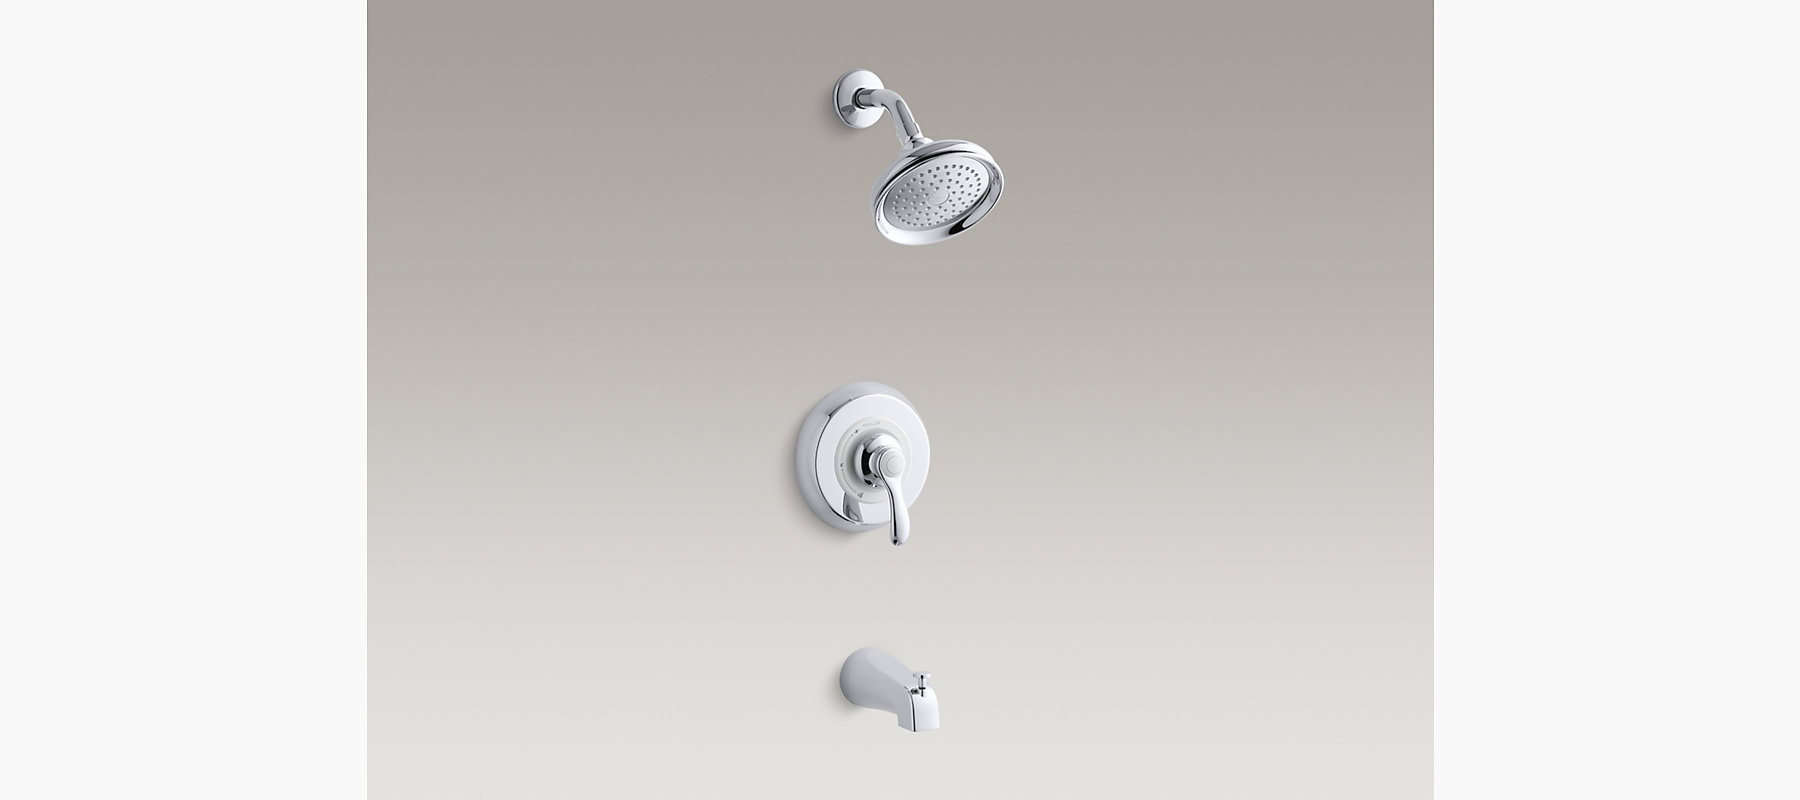 KOHLER| Fairfax Rite-Temp Bath and Shower Faucet Trim | KOHLER